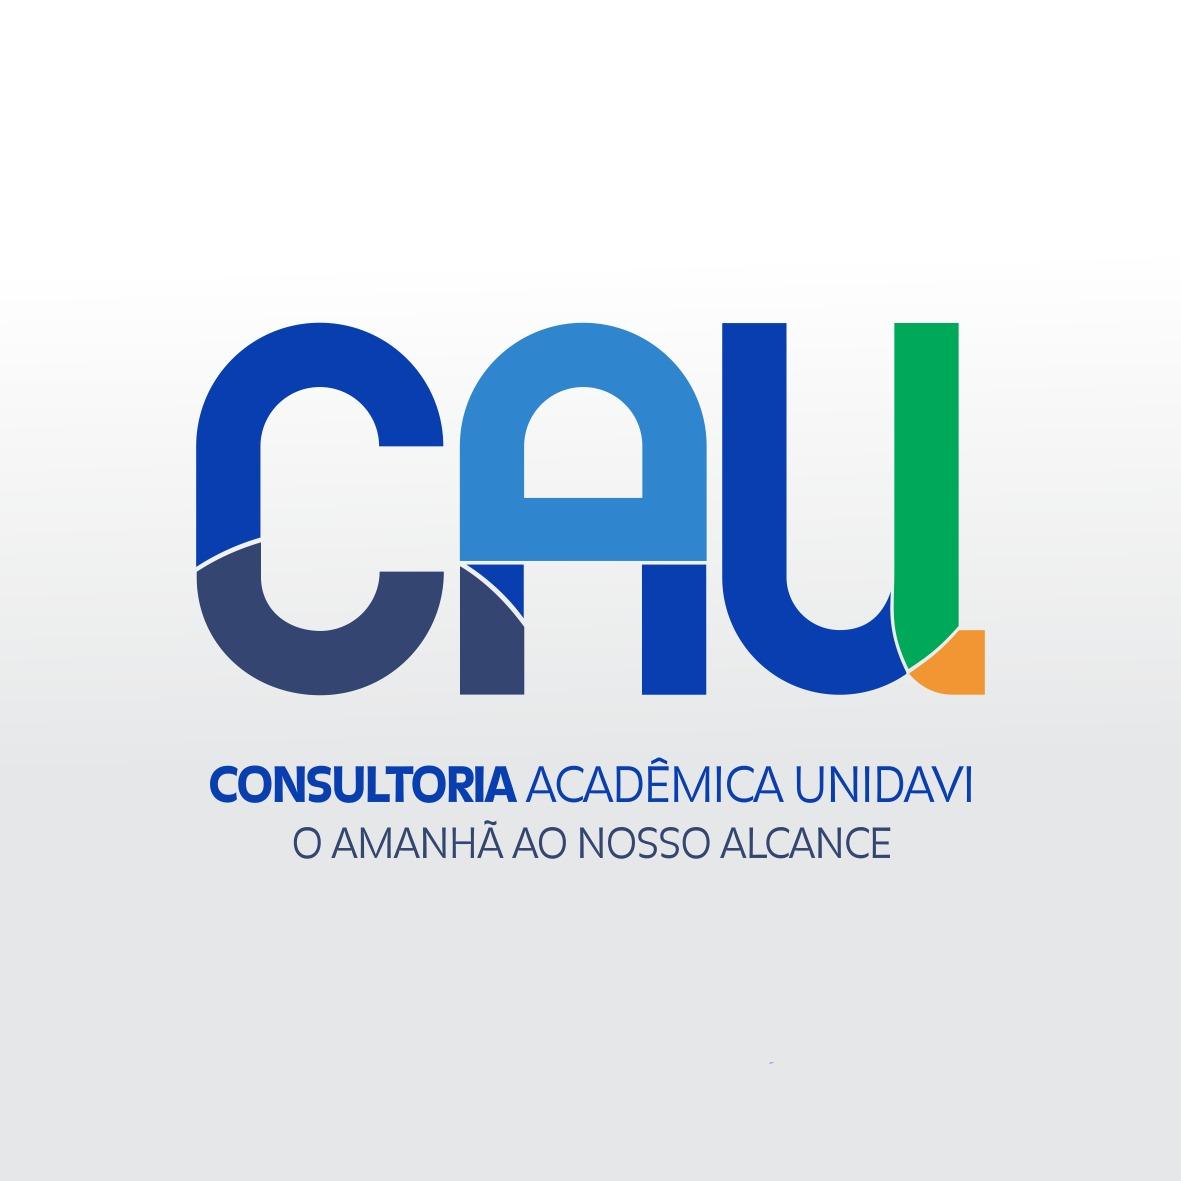 Consultoria Acadêmica Unidavi - CAU